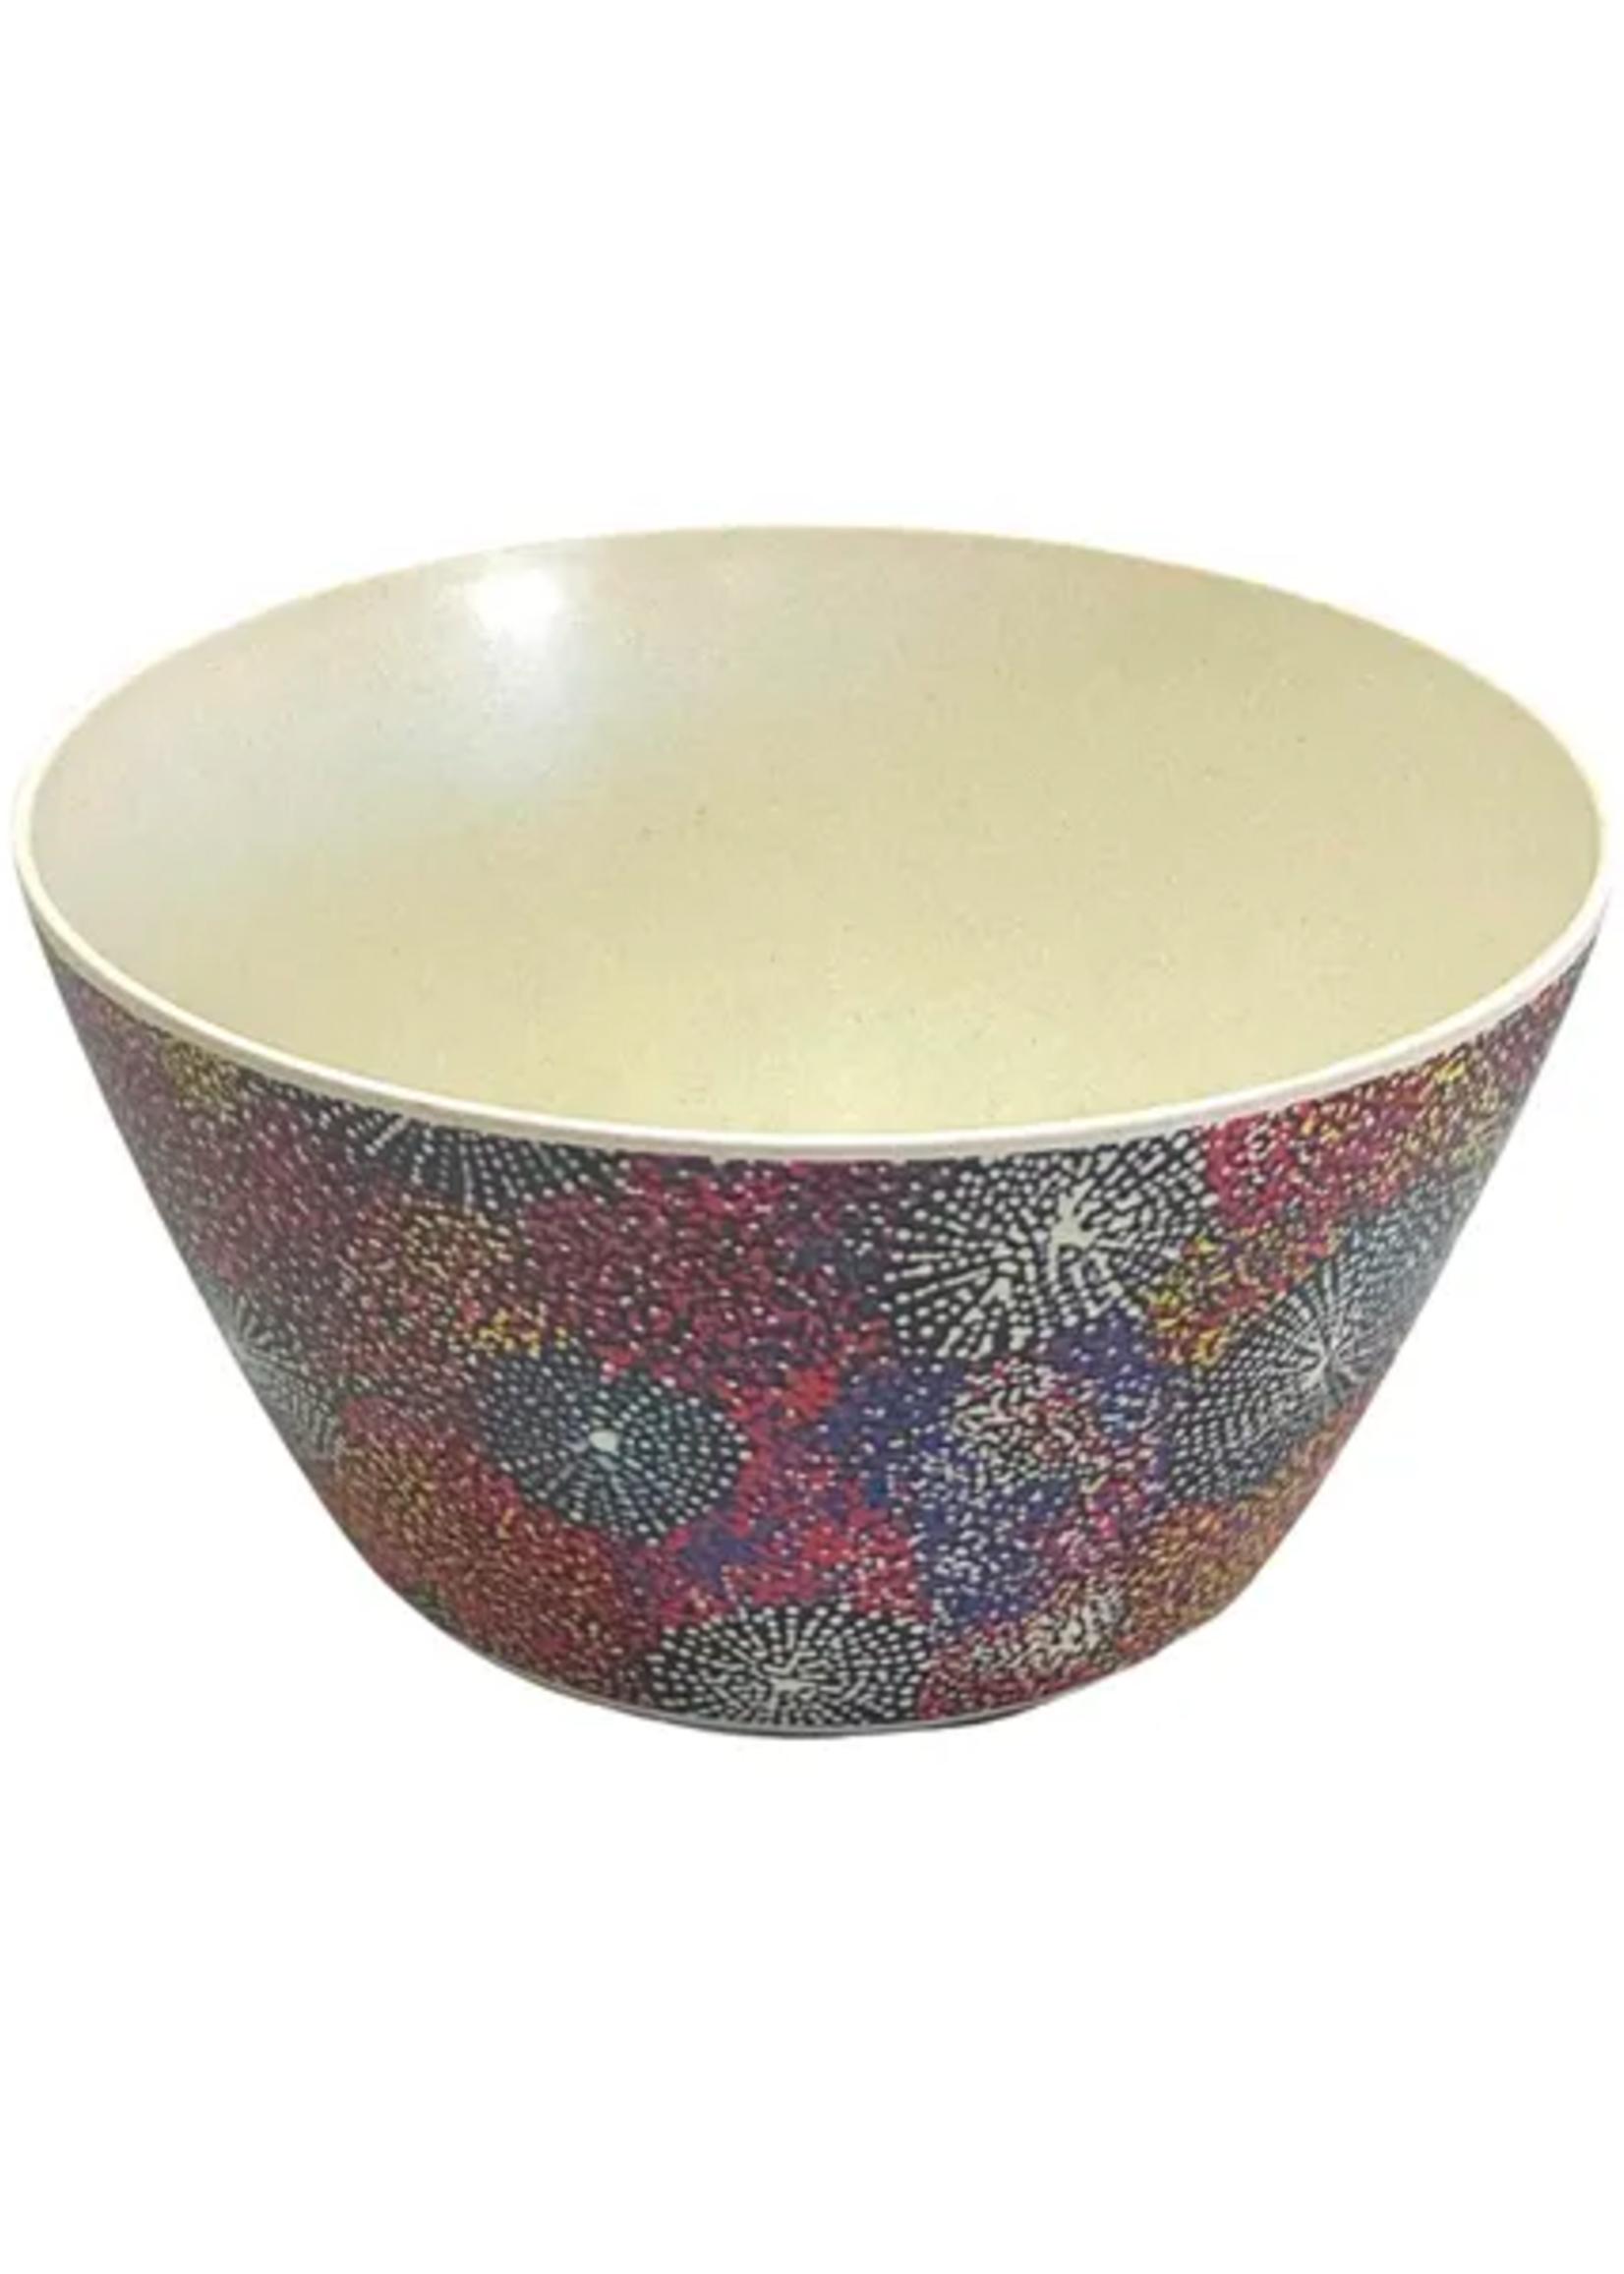 Utopia Bamboo Bowl Small 216 - Katie Morgan